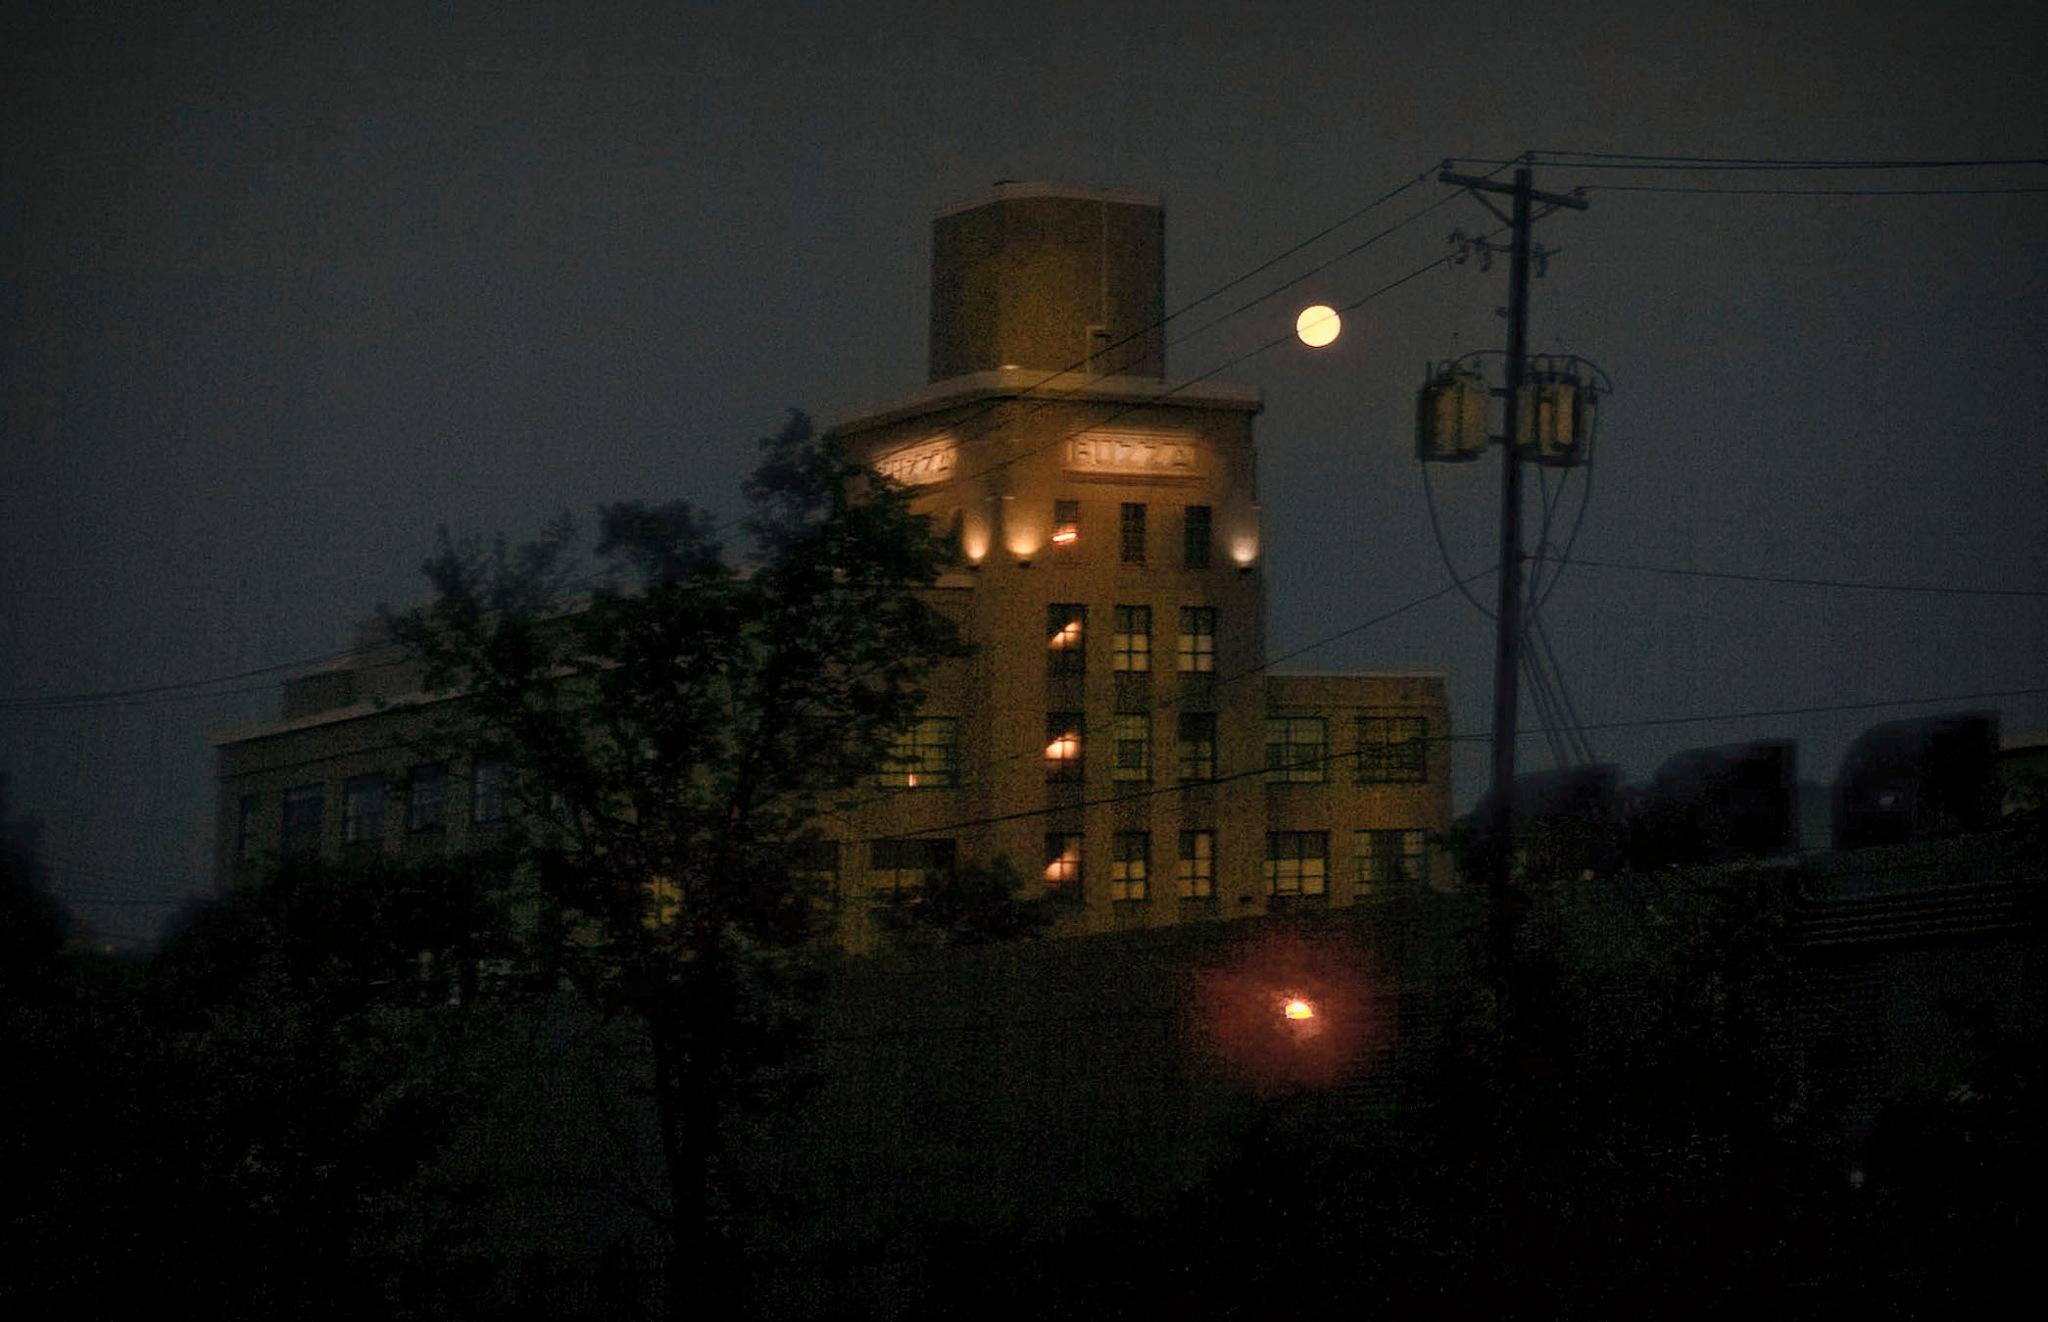 Moon Rising 9:10 by Robert Henry